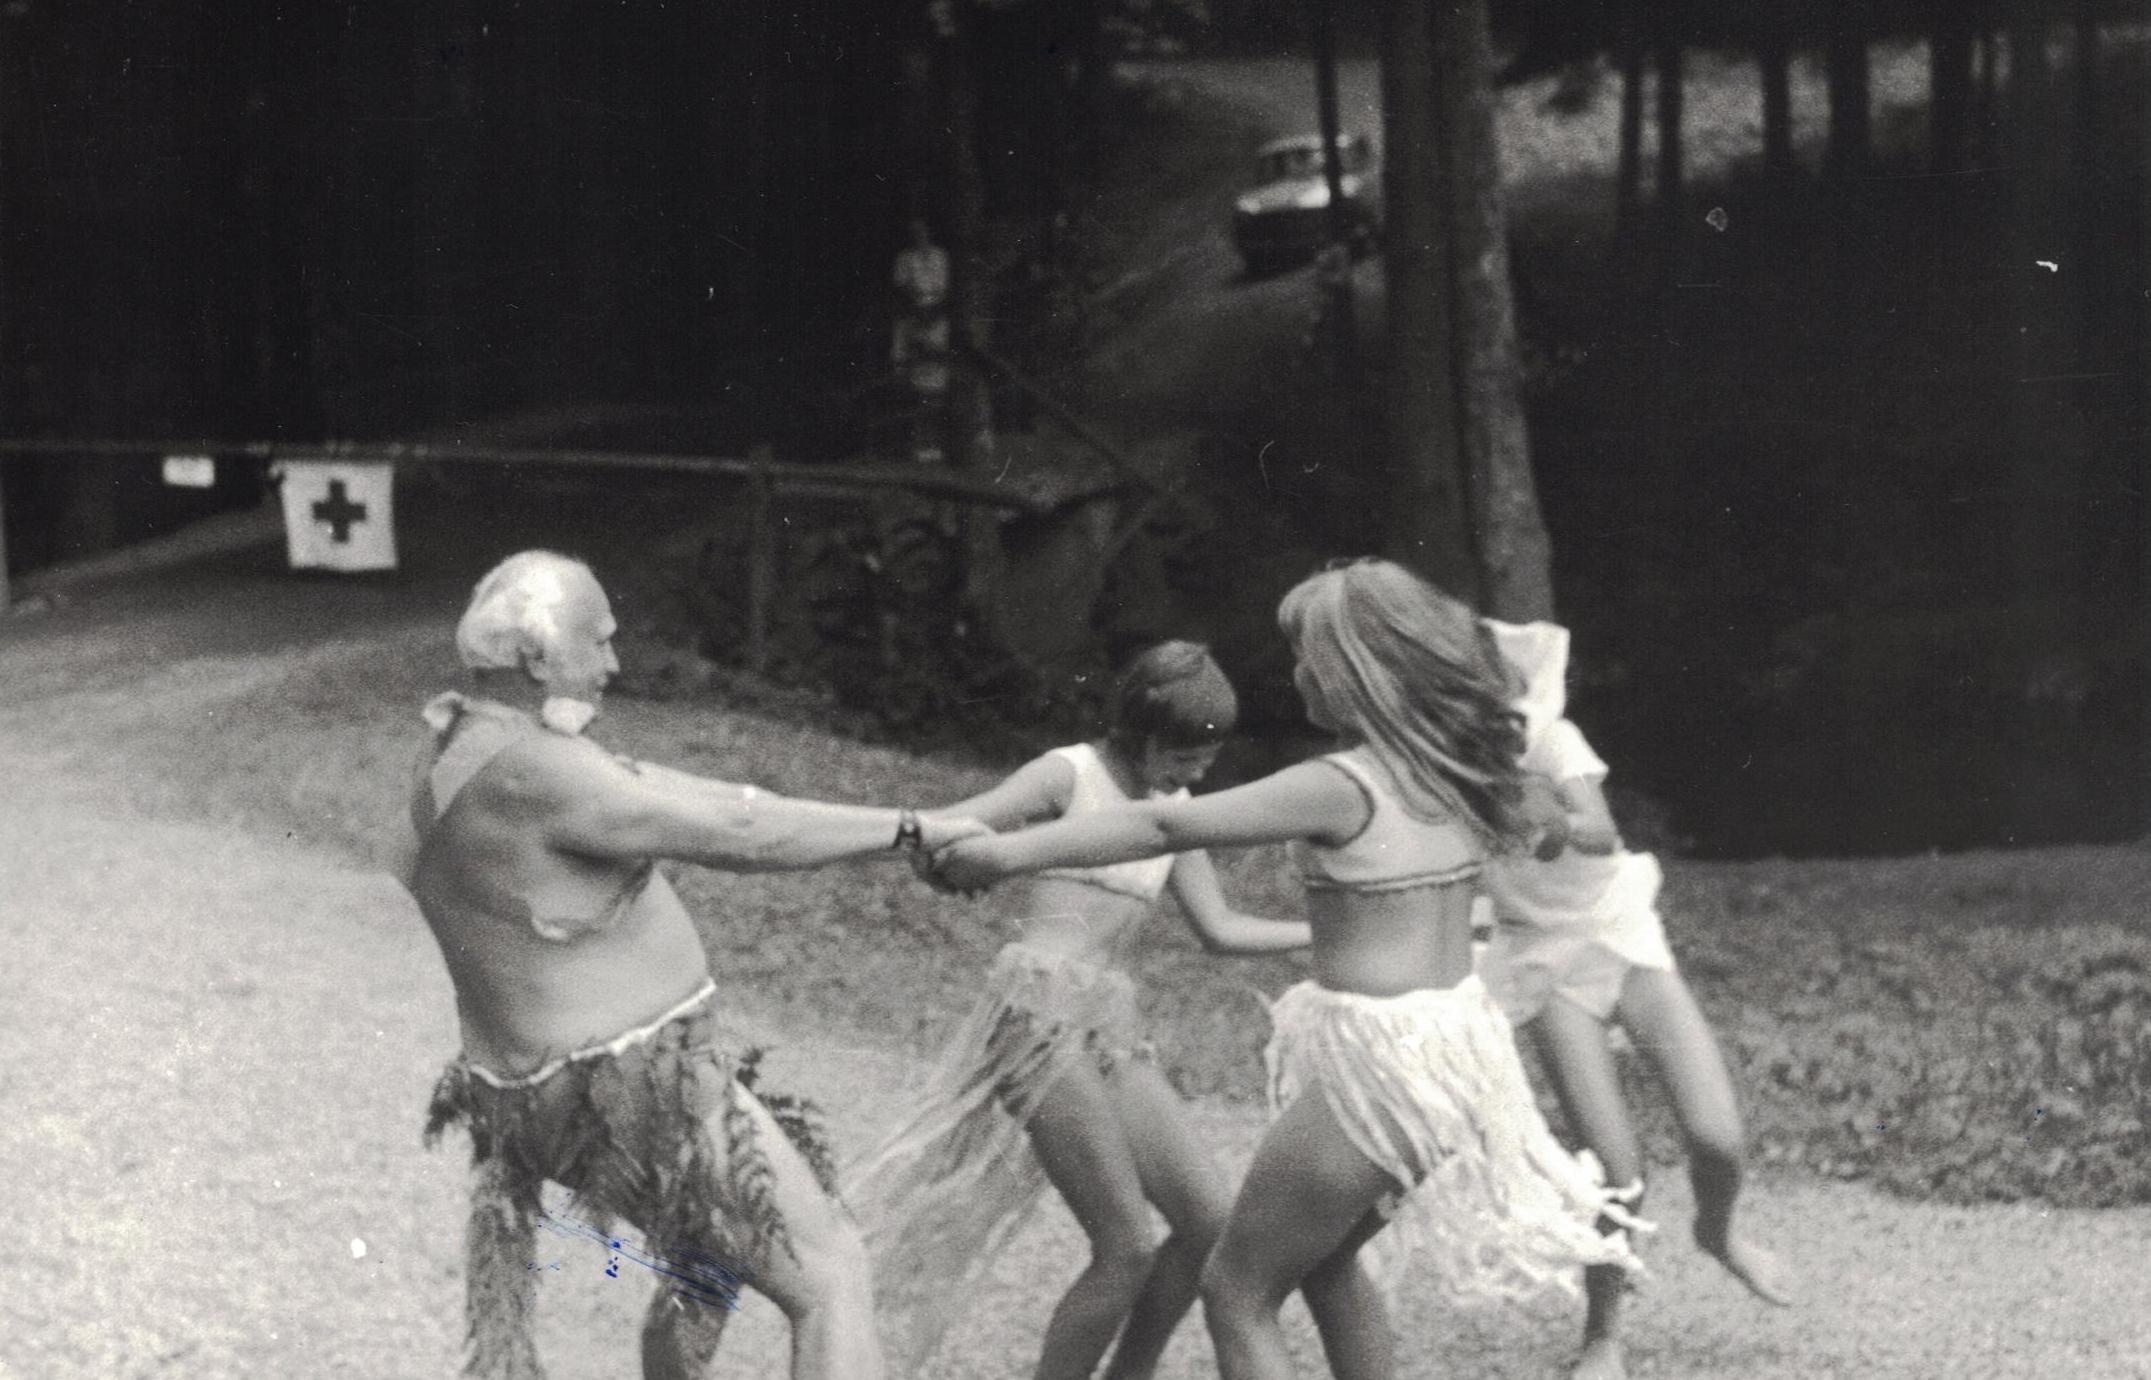 https://www.rudolfaci.cz/wp-content/uploads/2020/11/1975_Karneval_01-1.jpg